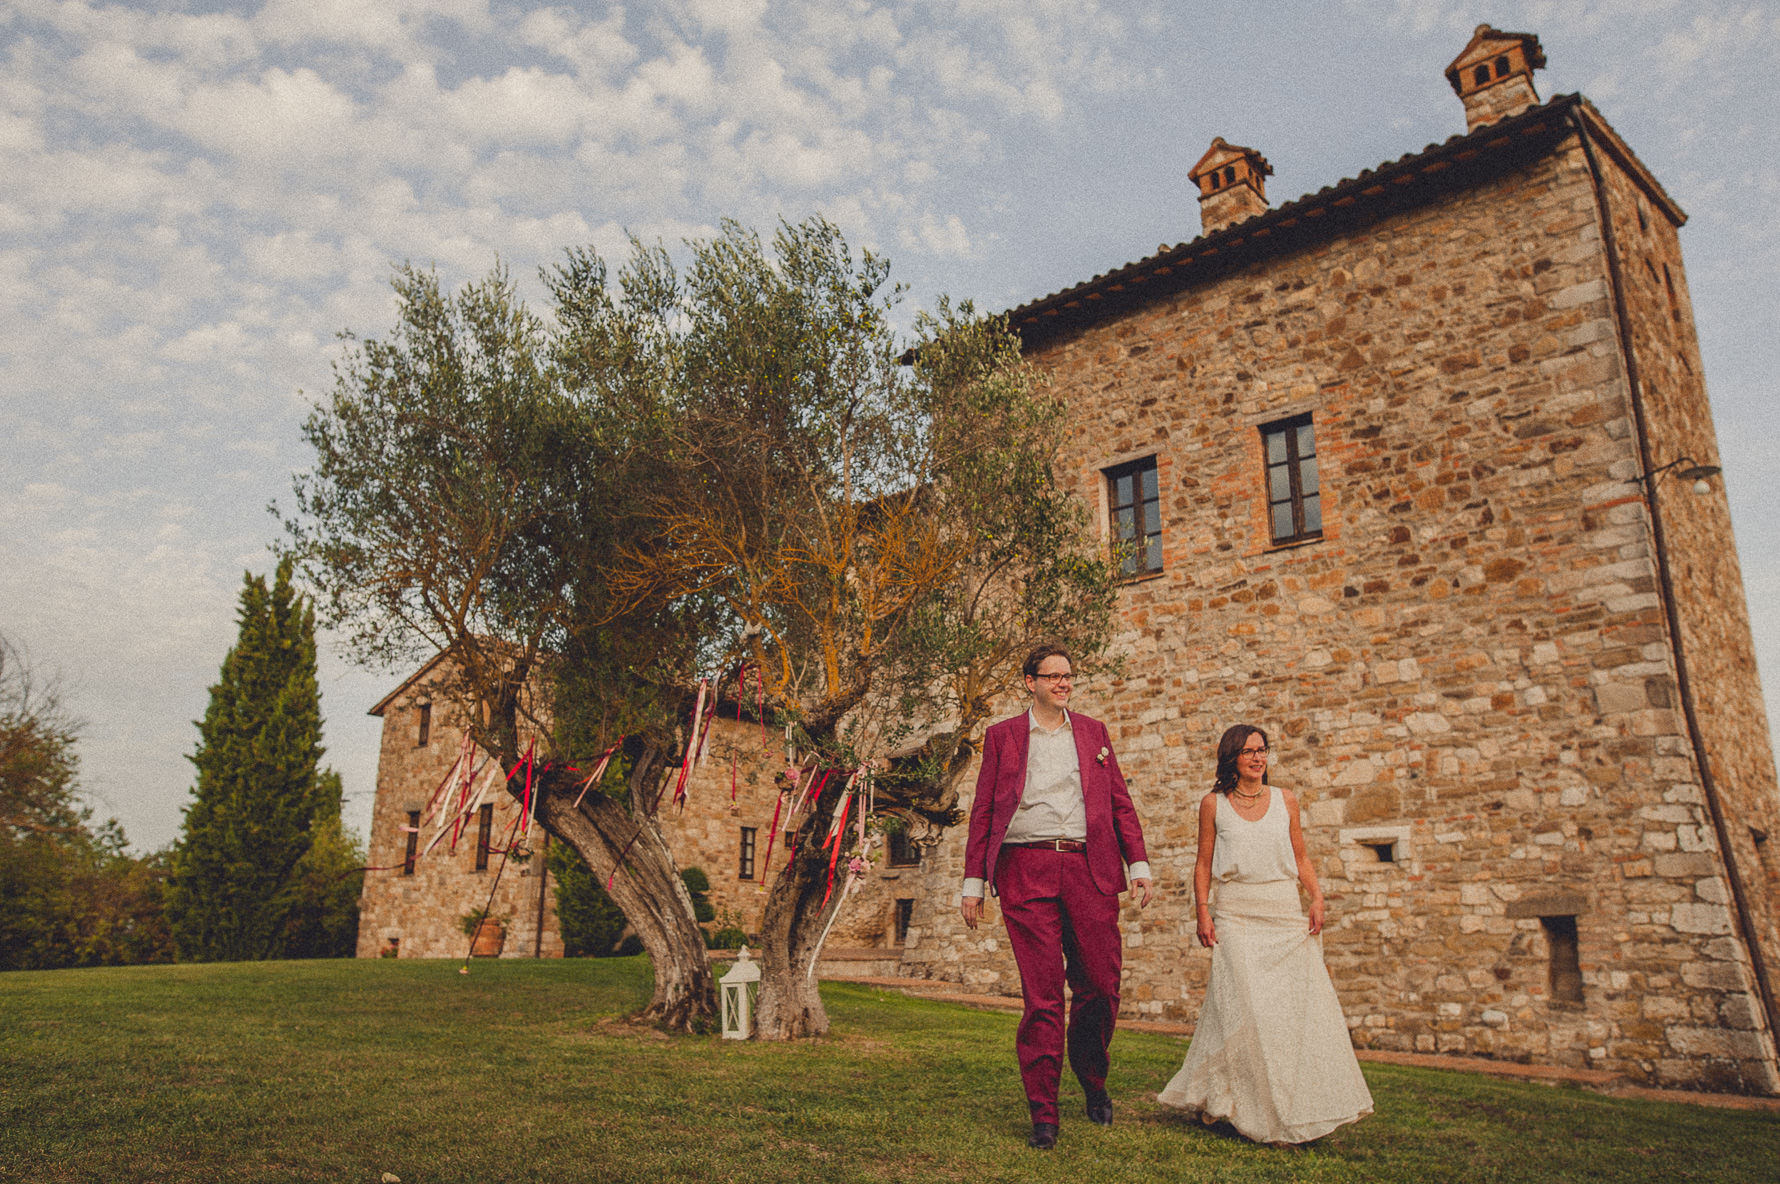 livio-lacurre-italy-destination-wedding-photographer